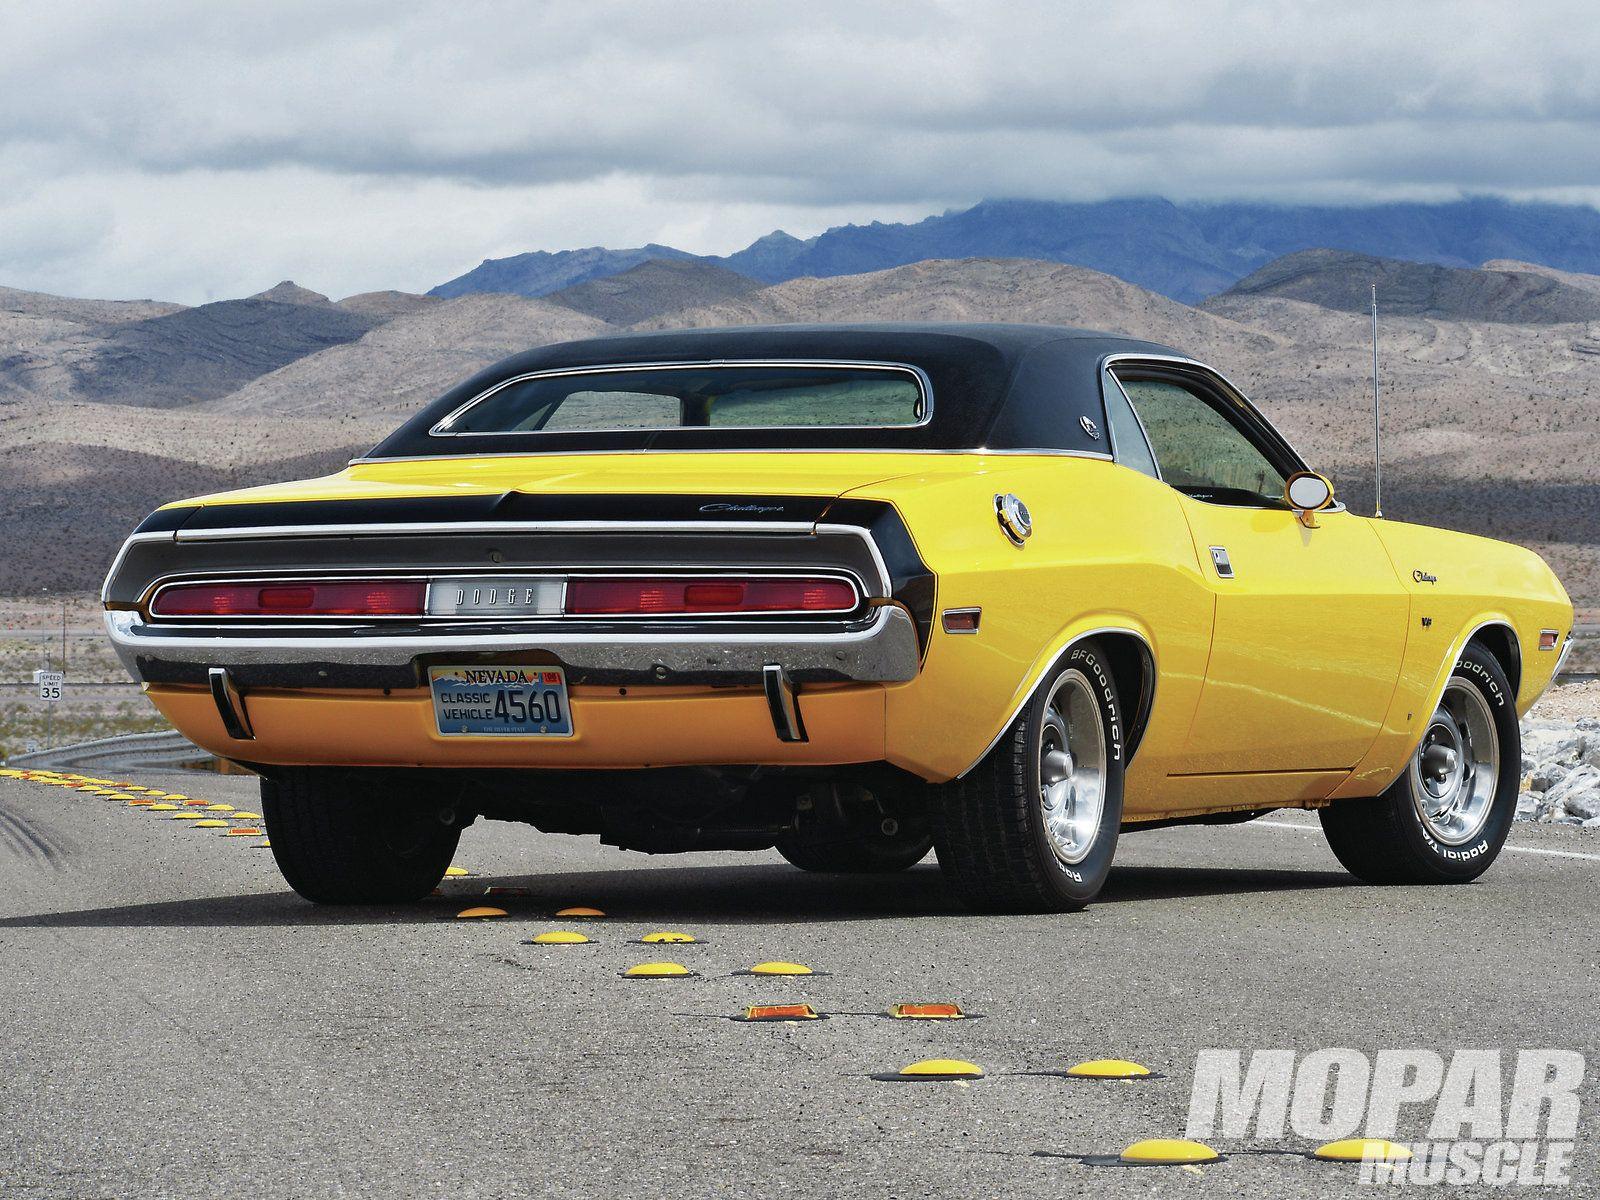 mopar | Mopar Muscle Cars - The Best Of The Best Photo Gallery ...